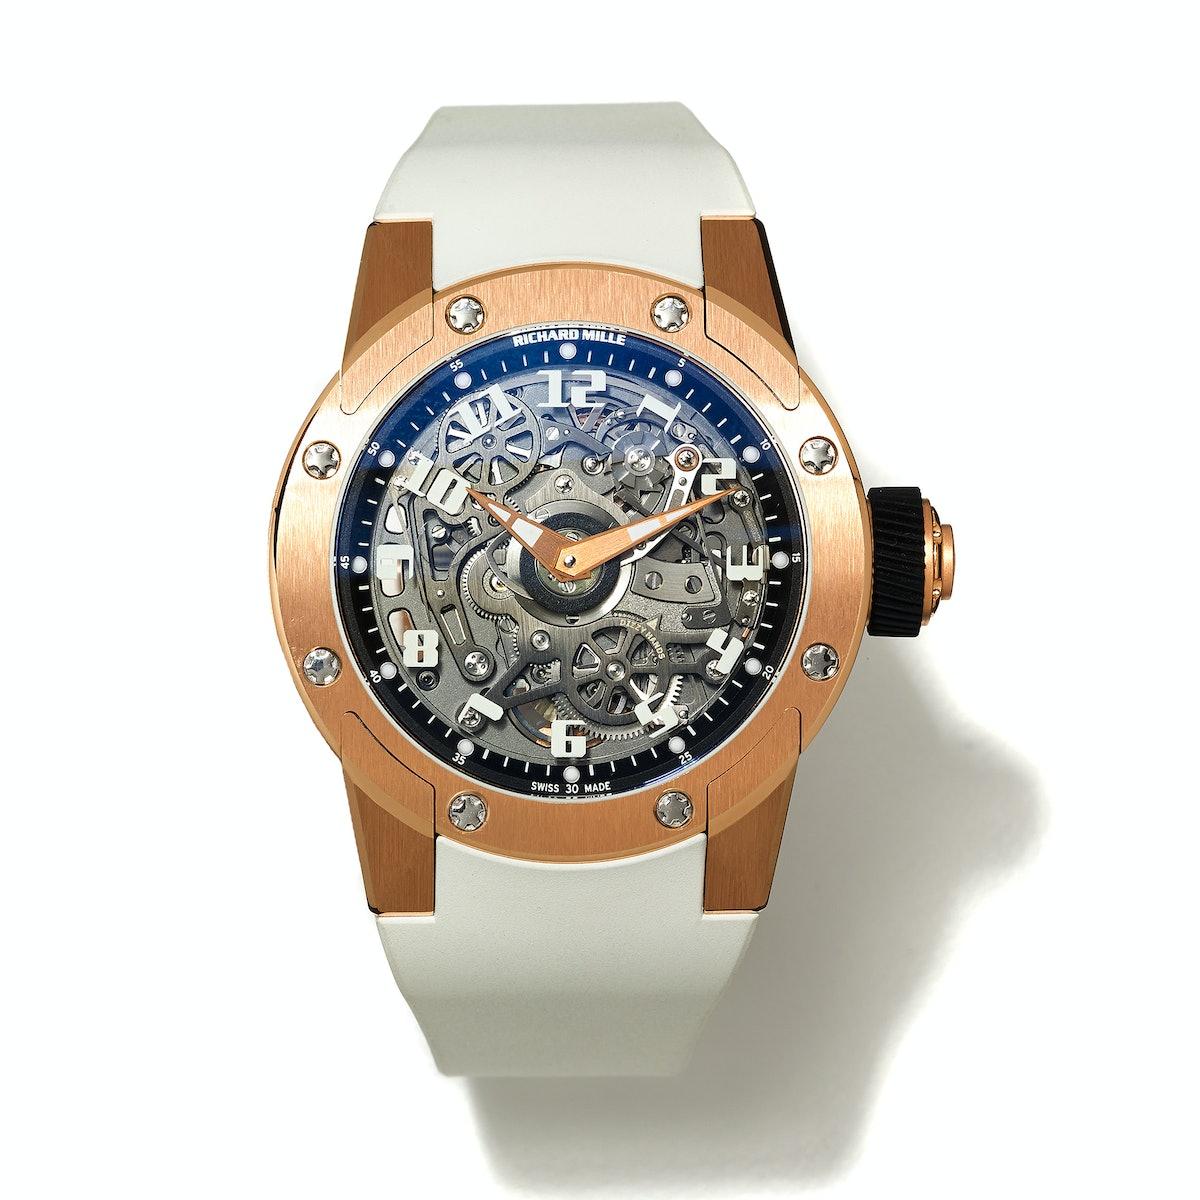 Richard Mille gold and titanium watch